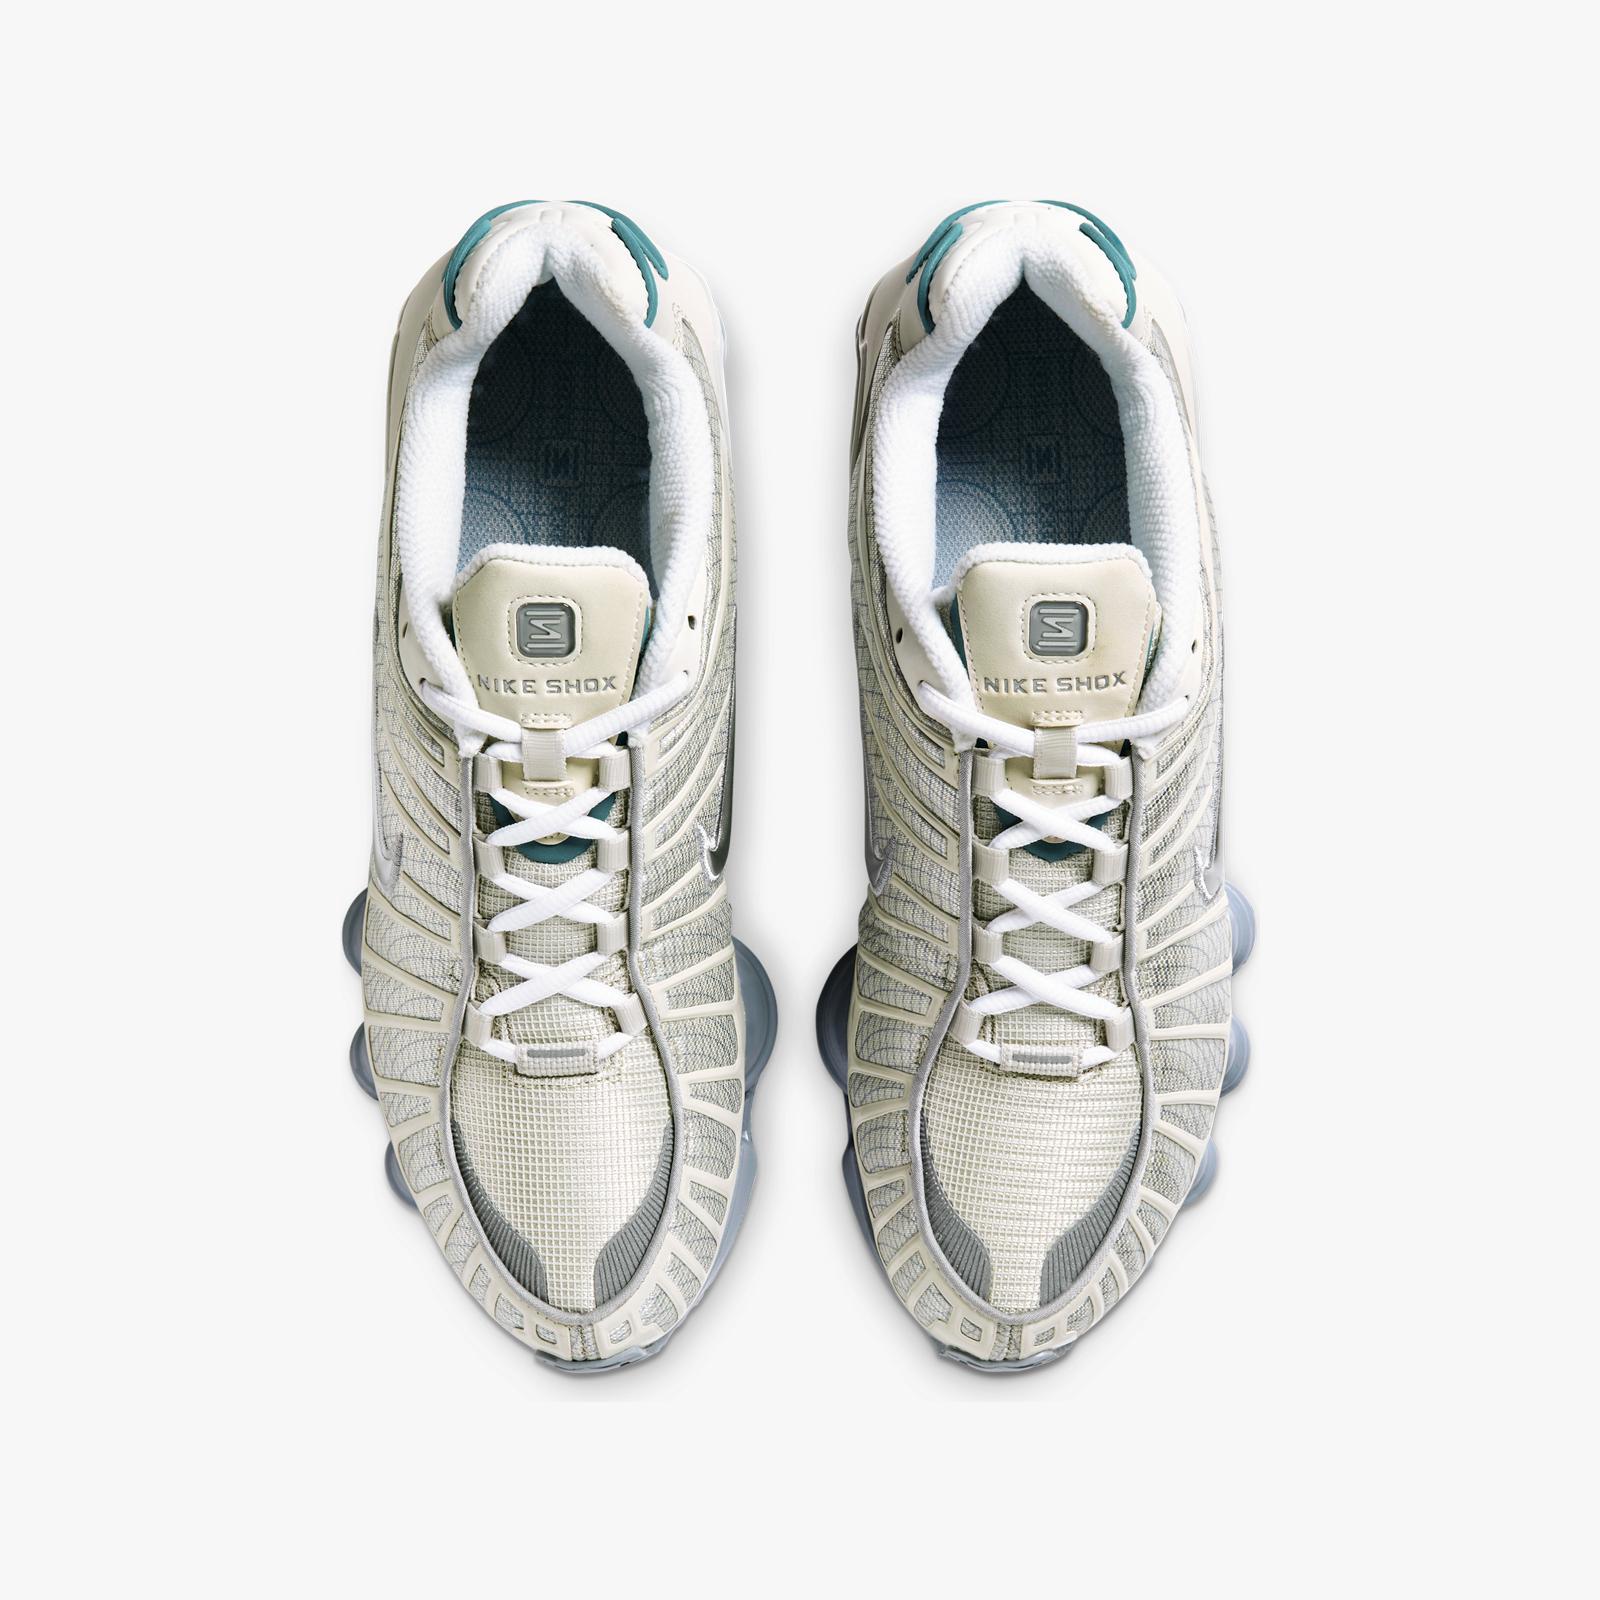 Nike Shox TL GEL - Ct8417-001